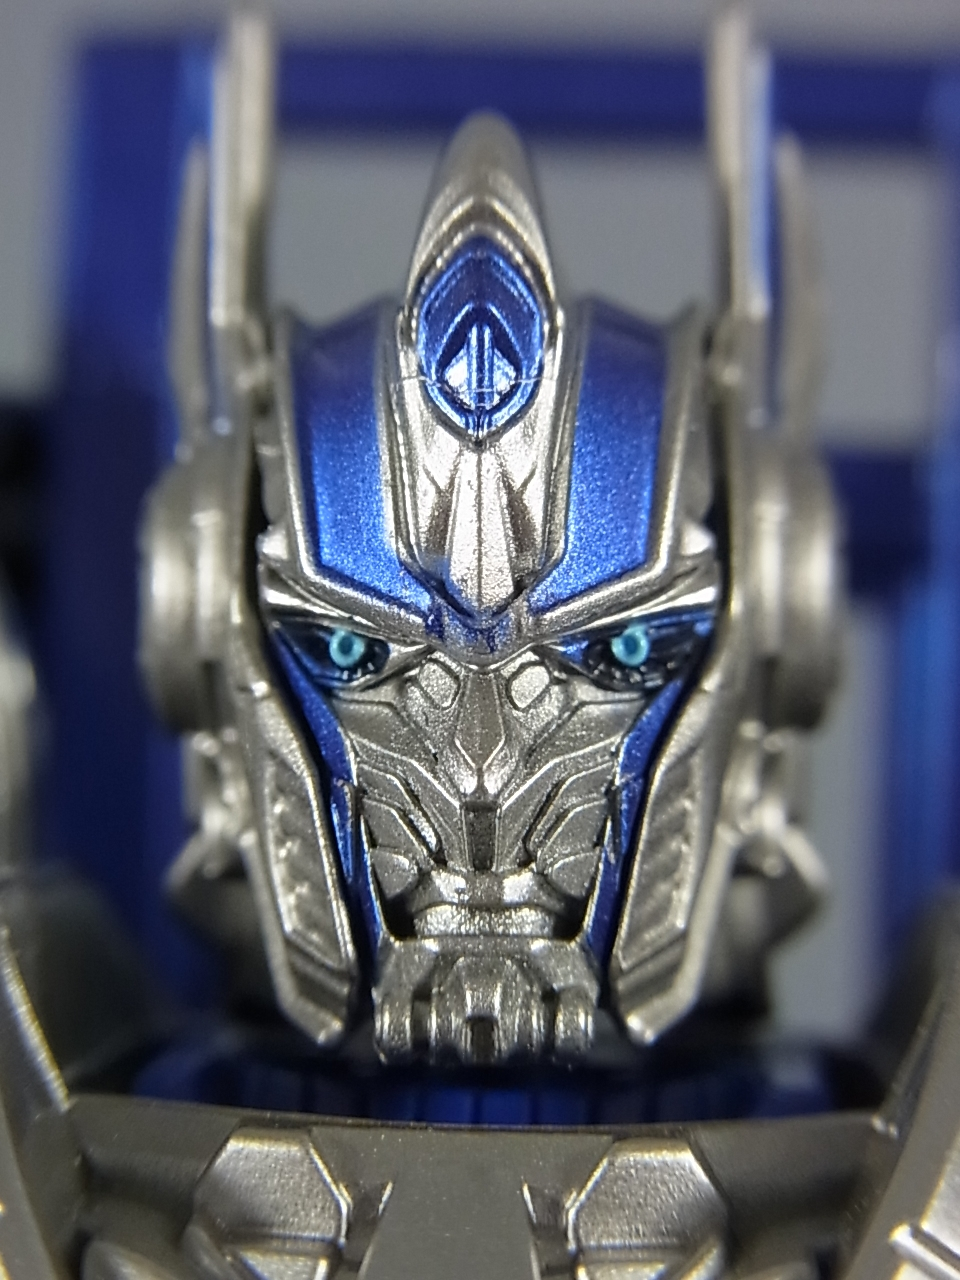 Takara Tomy Ad-31 Armor Knight Optimus Prime Ad-31 Armor Knight Optimus